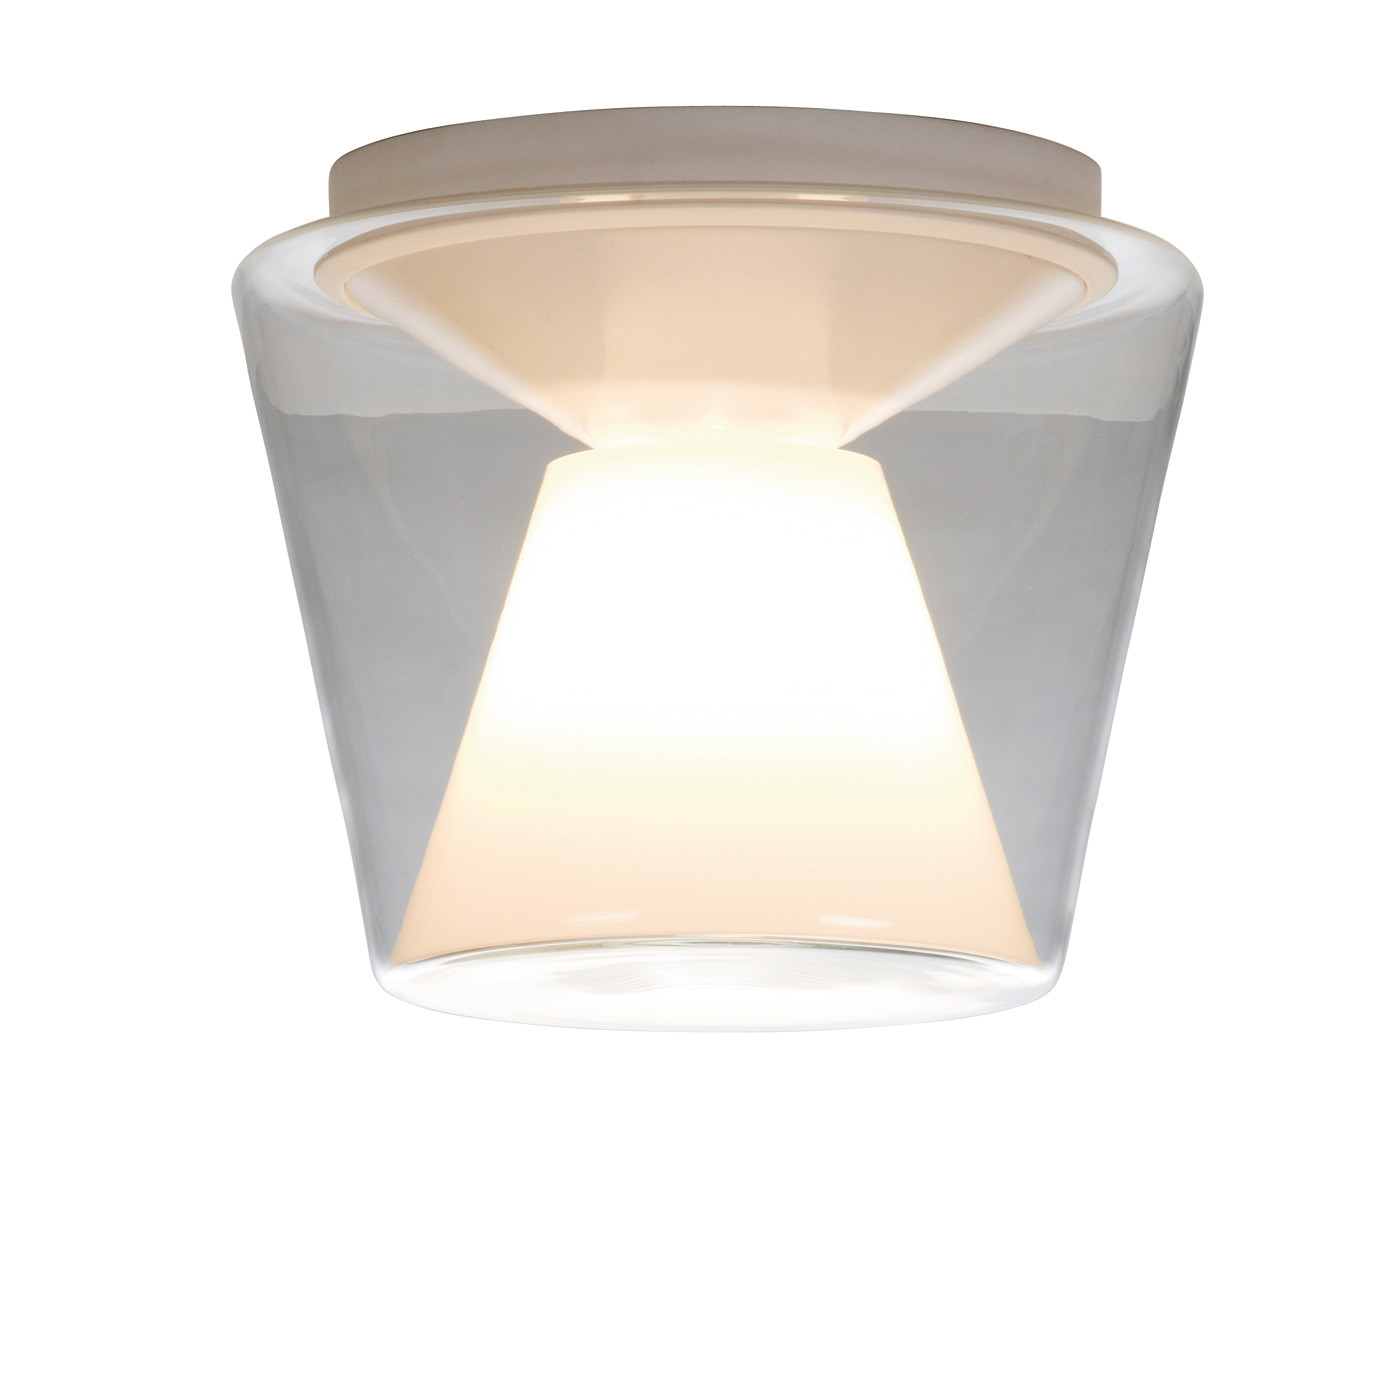 Serien Lighting Annex Ceiling L